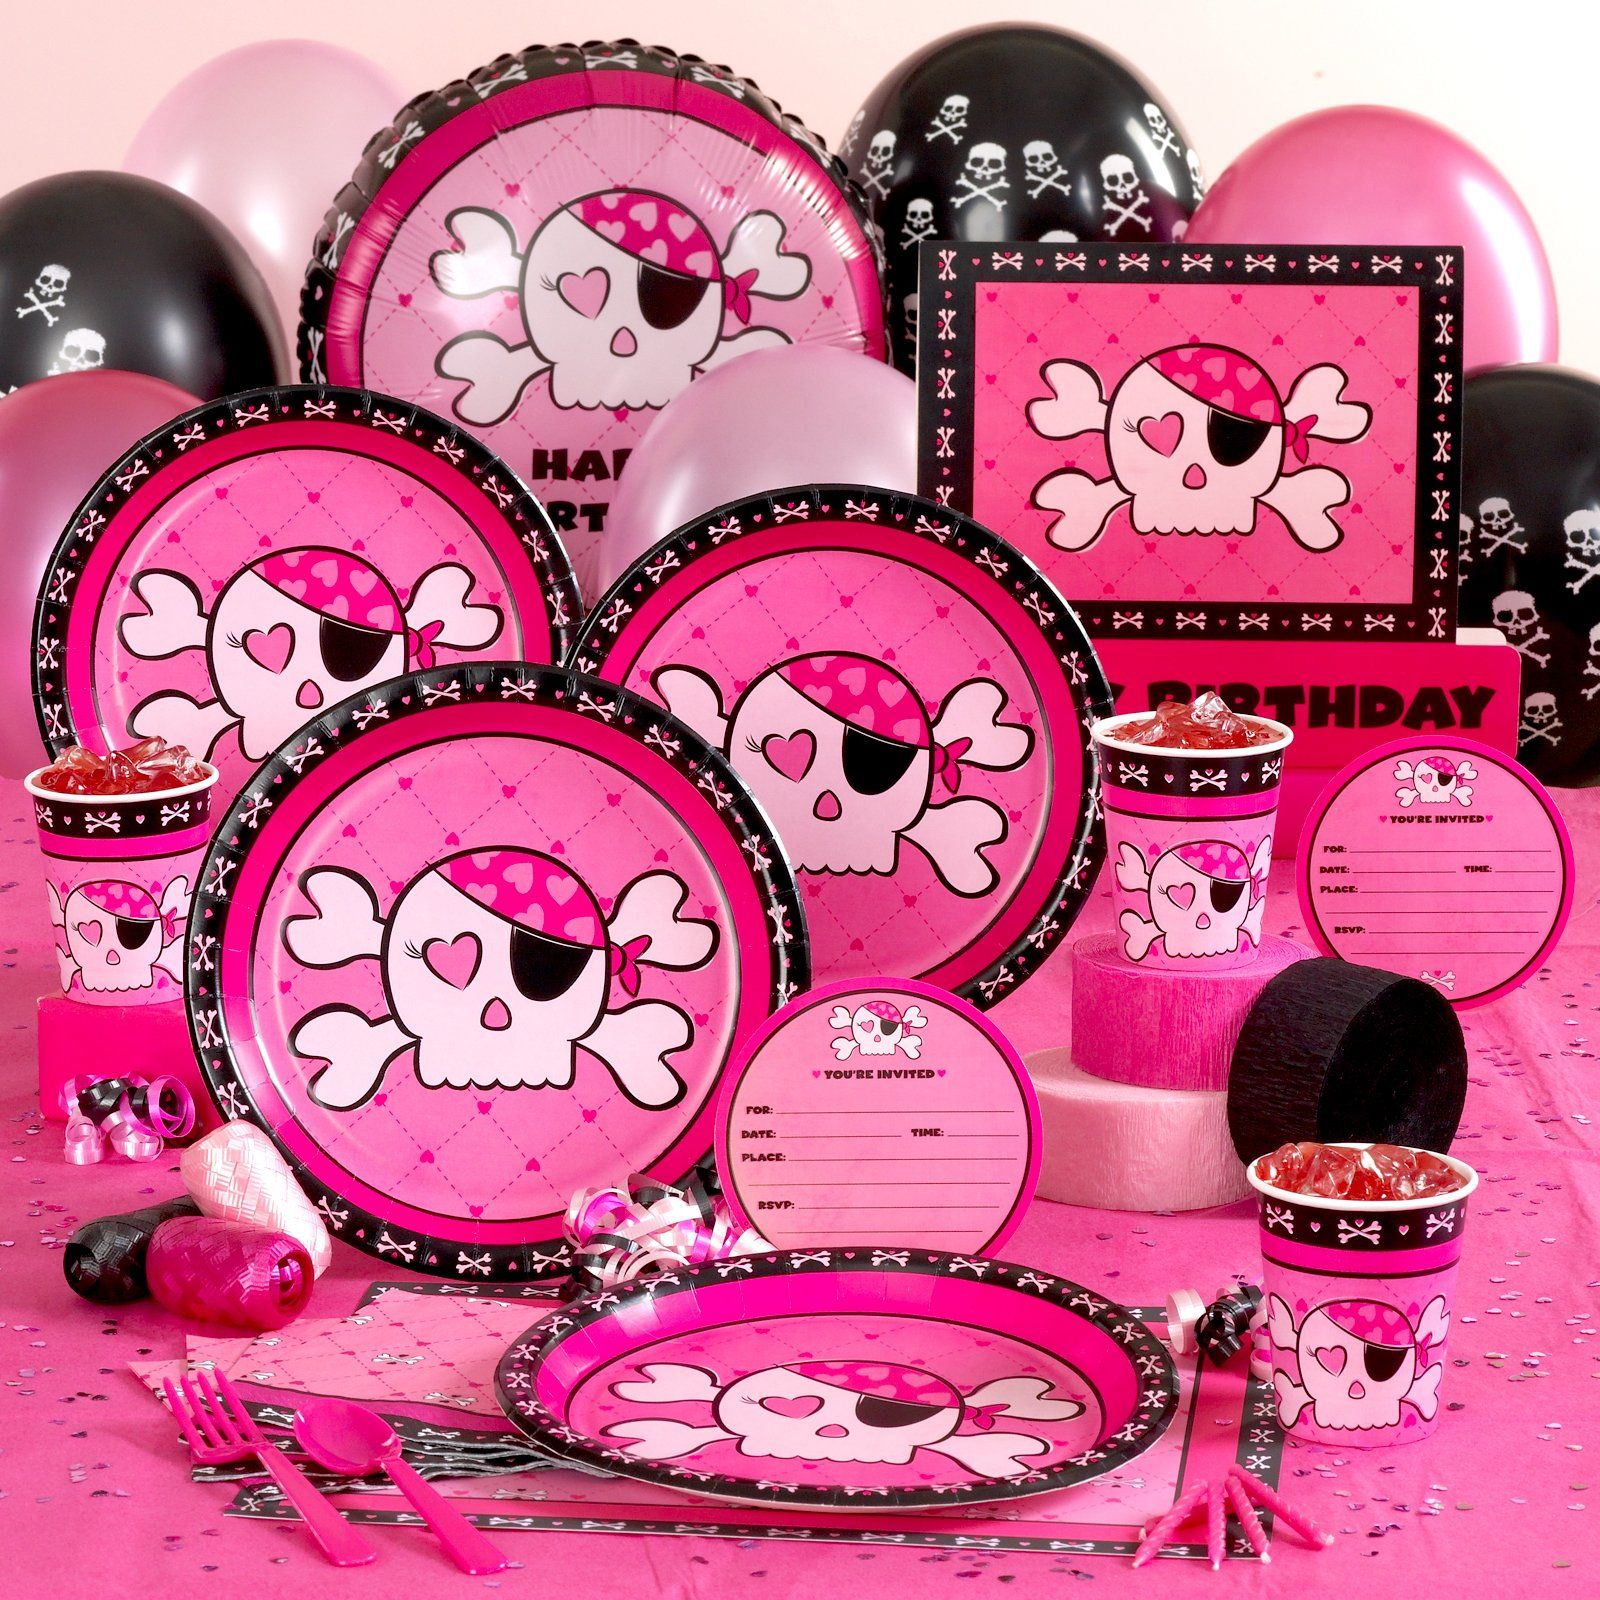 Housewives handjob pink girl pirate party supplies nude ass